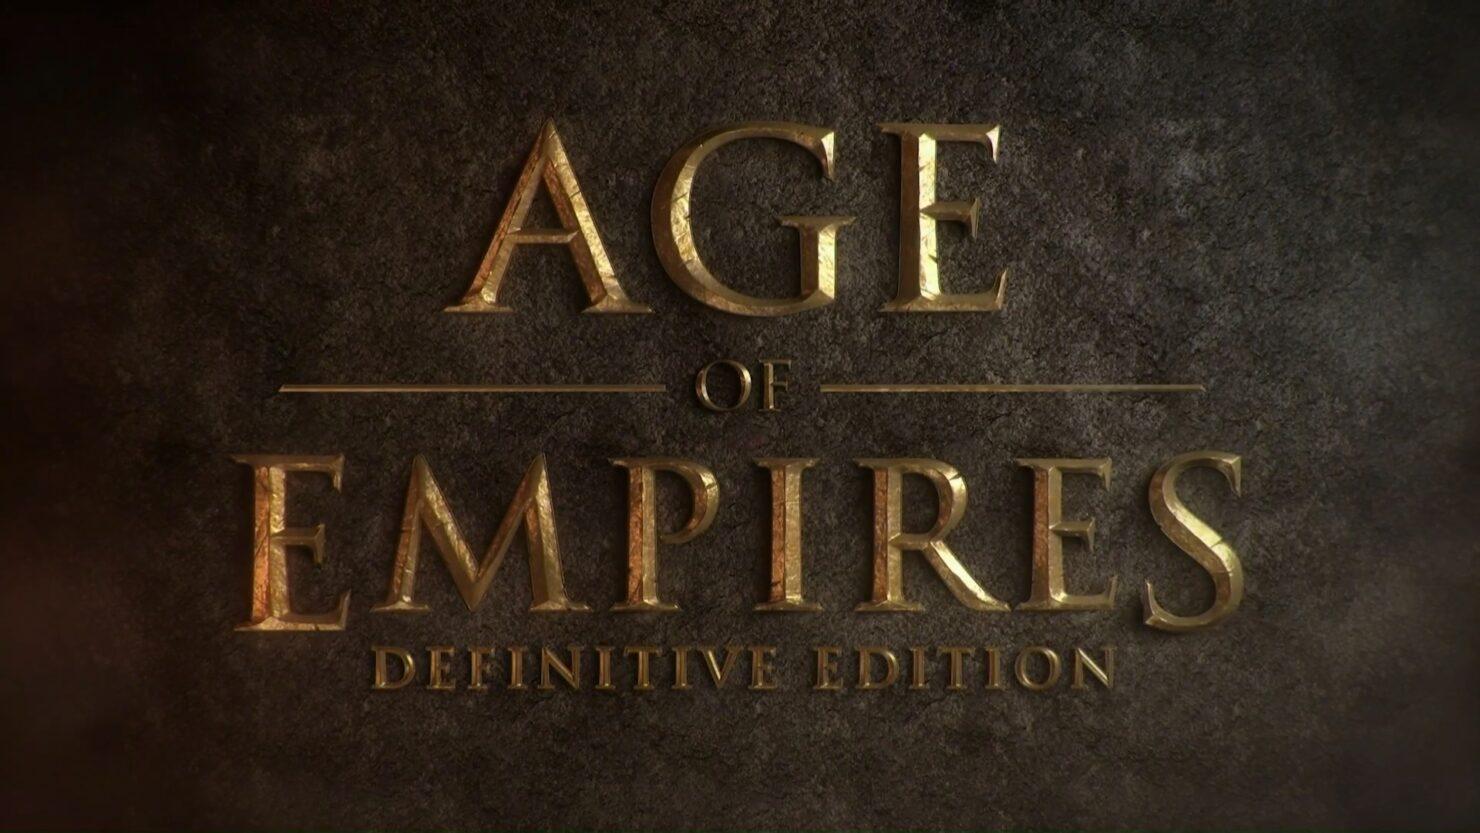 Age of Empires Definitive Edition 01 - Header